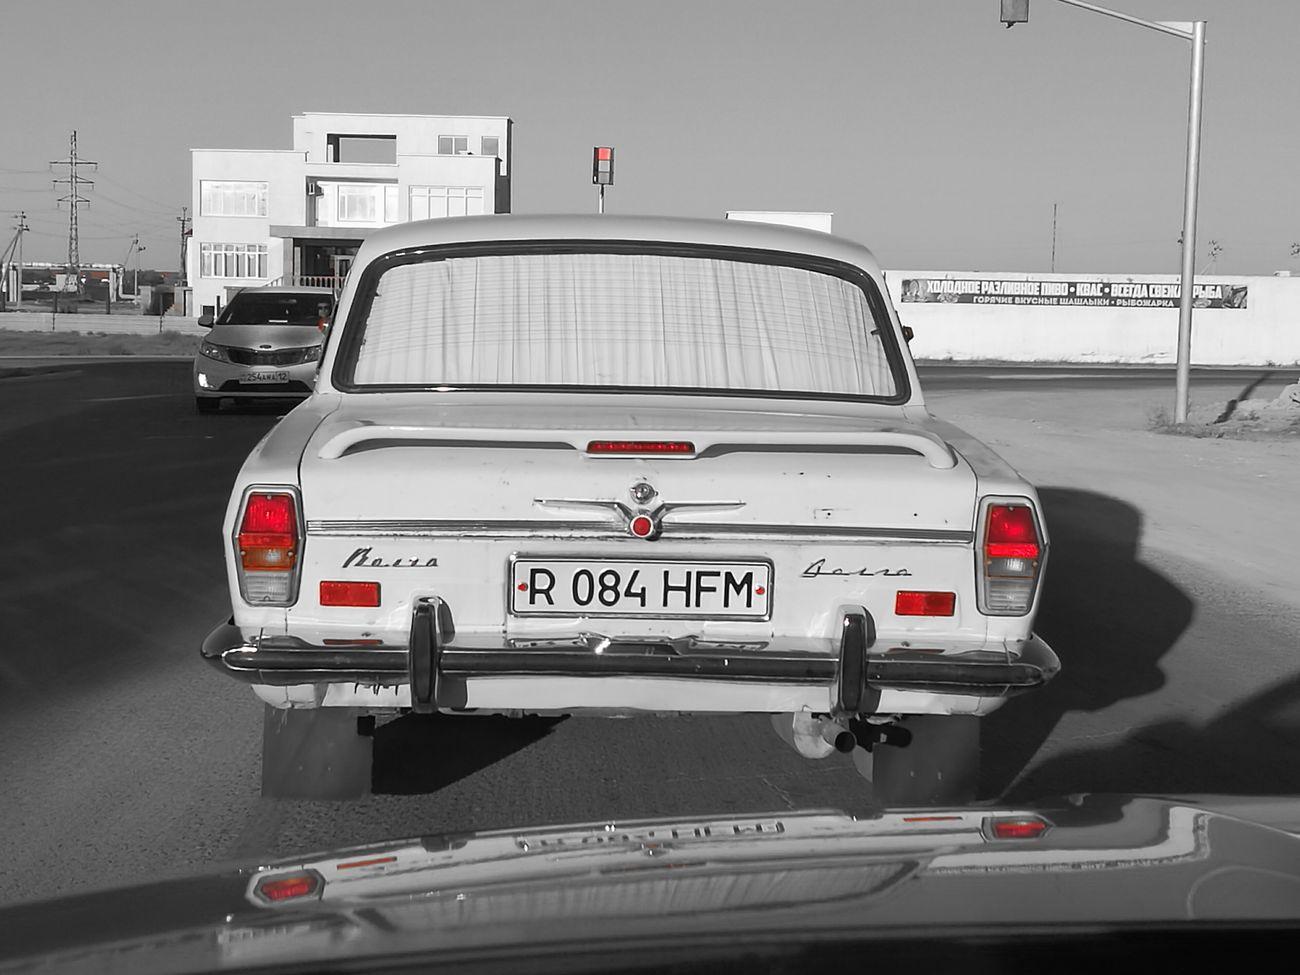 Волга Car Crime Racecar Transportation Auto Racing No People Outdoors Day First Eyeem Photo